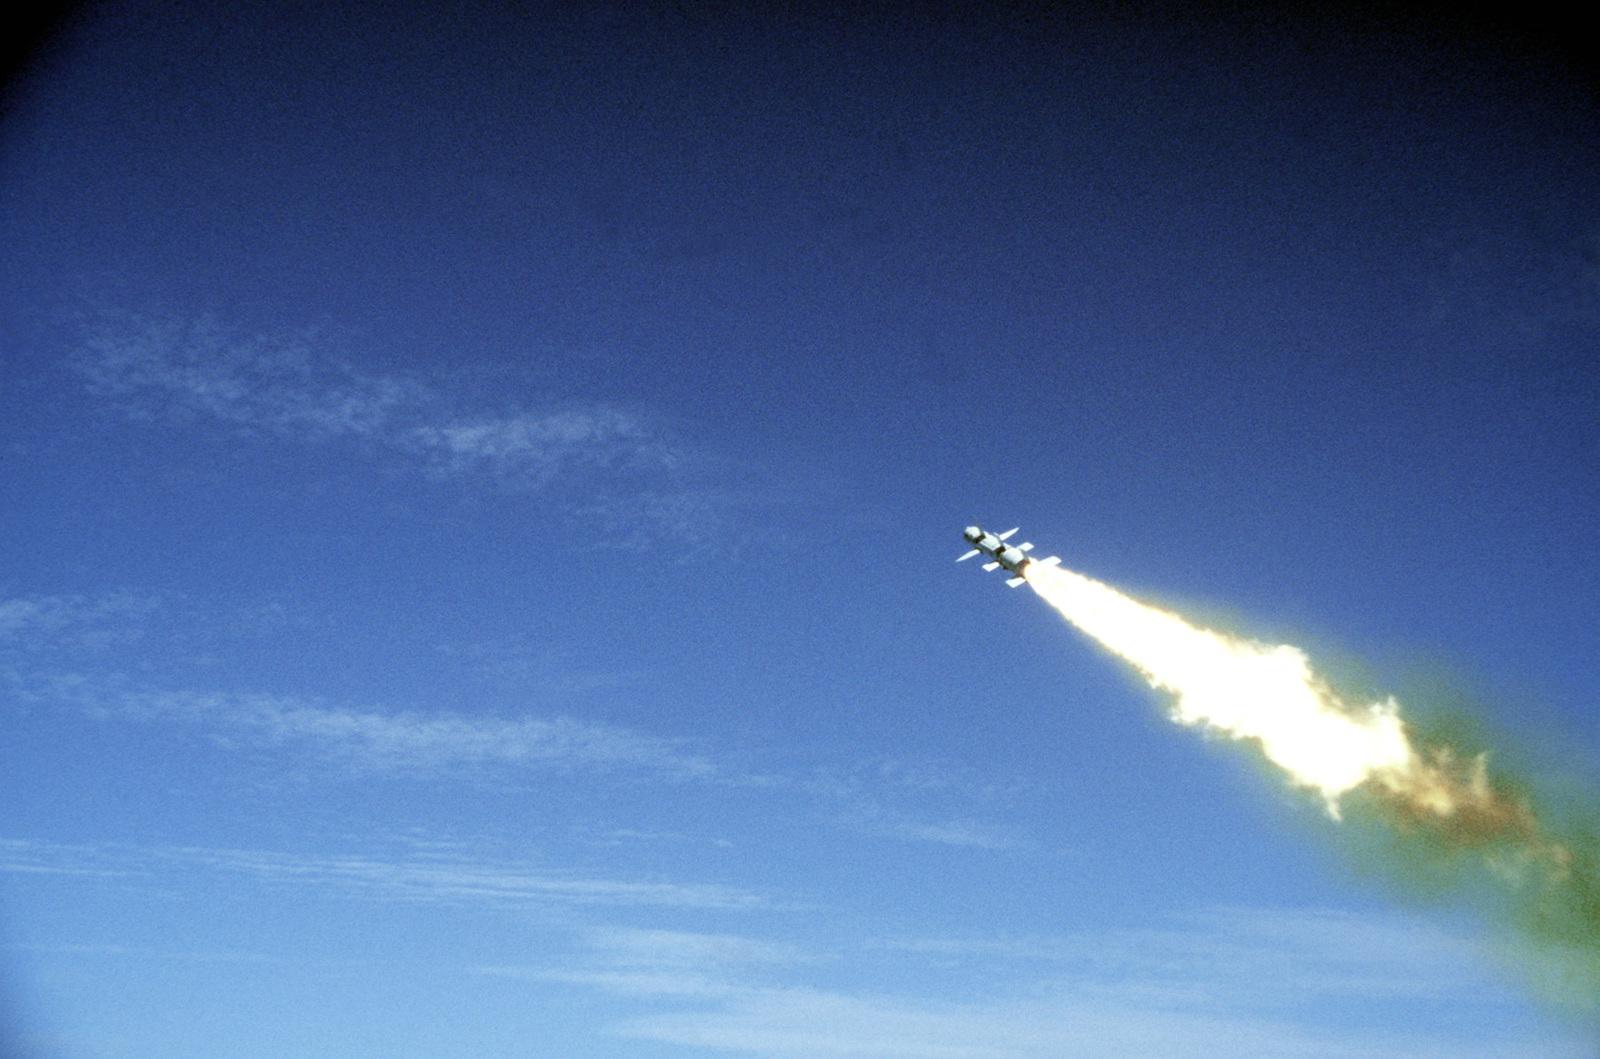 defeating cruise missiles air power australia - HD1600×1059